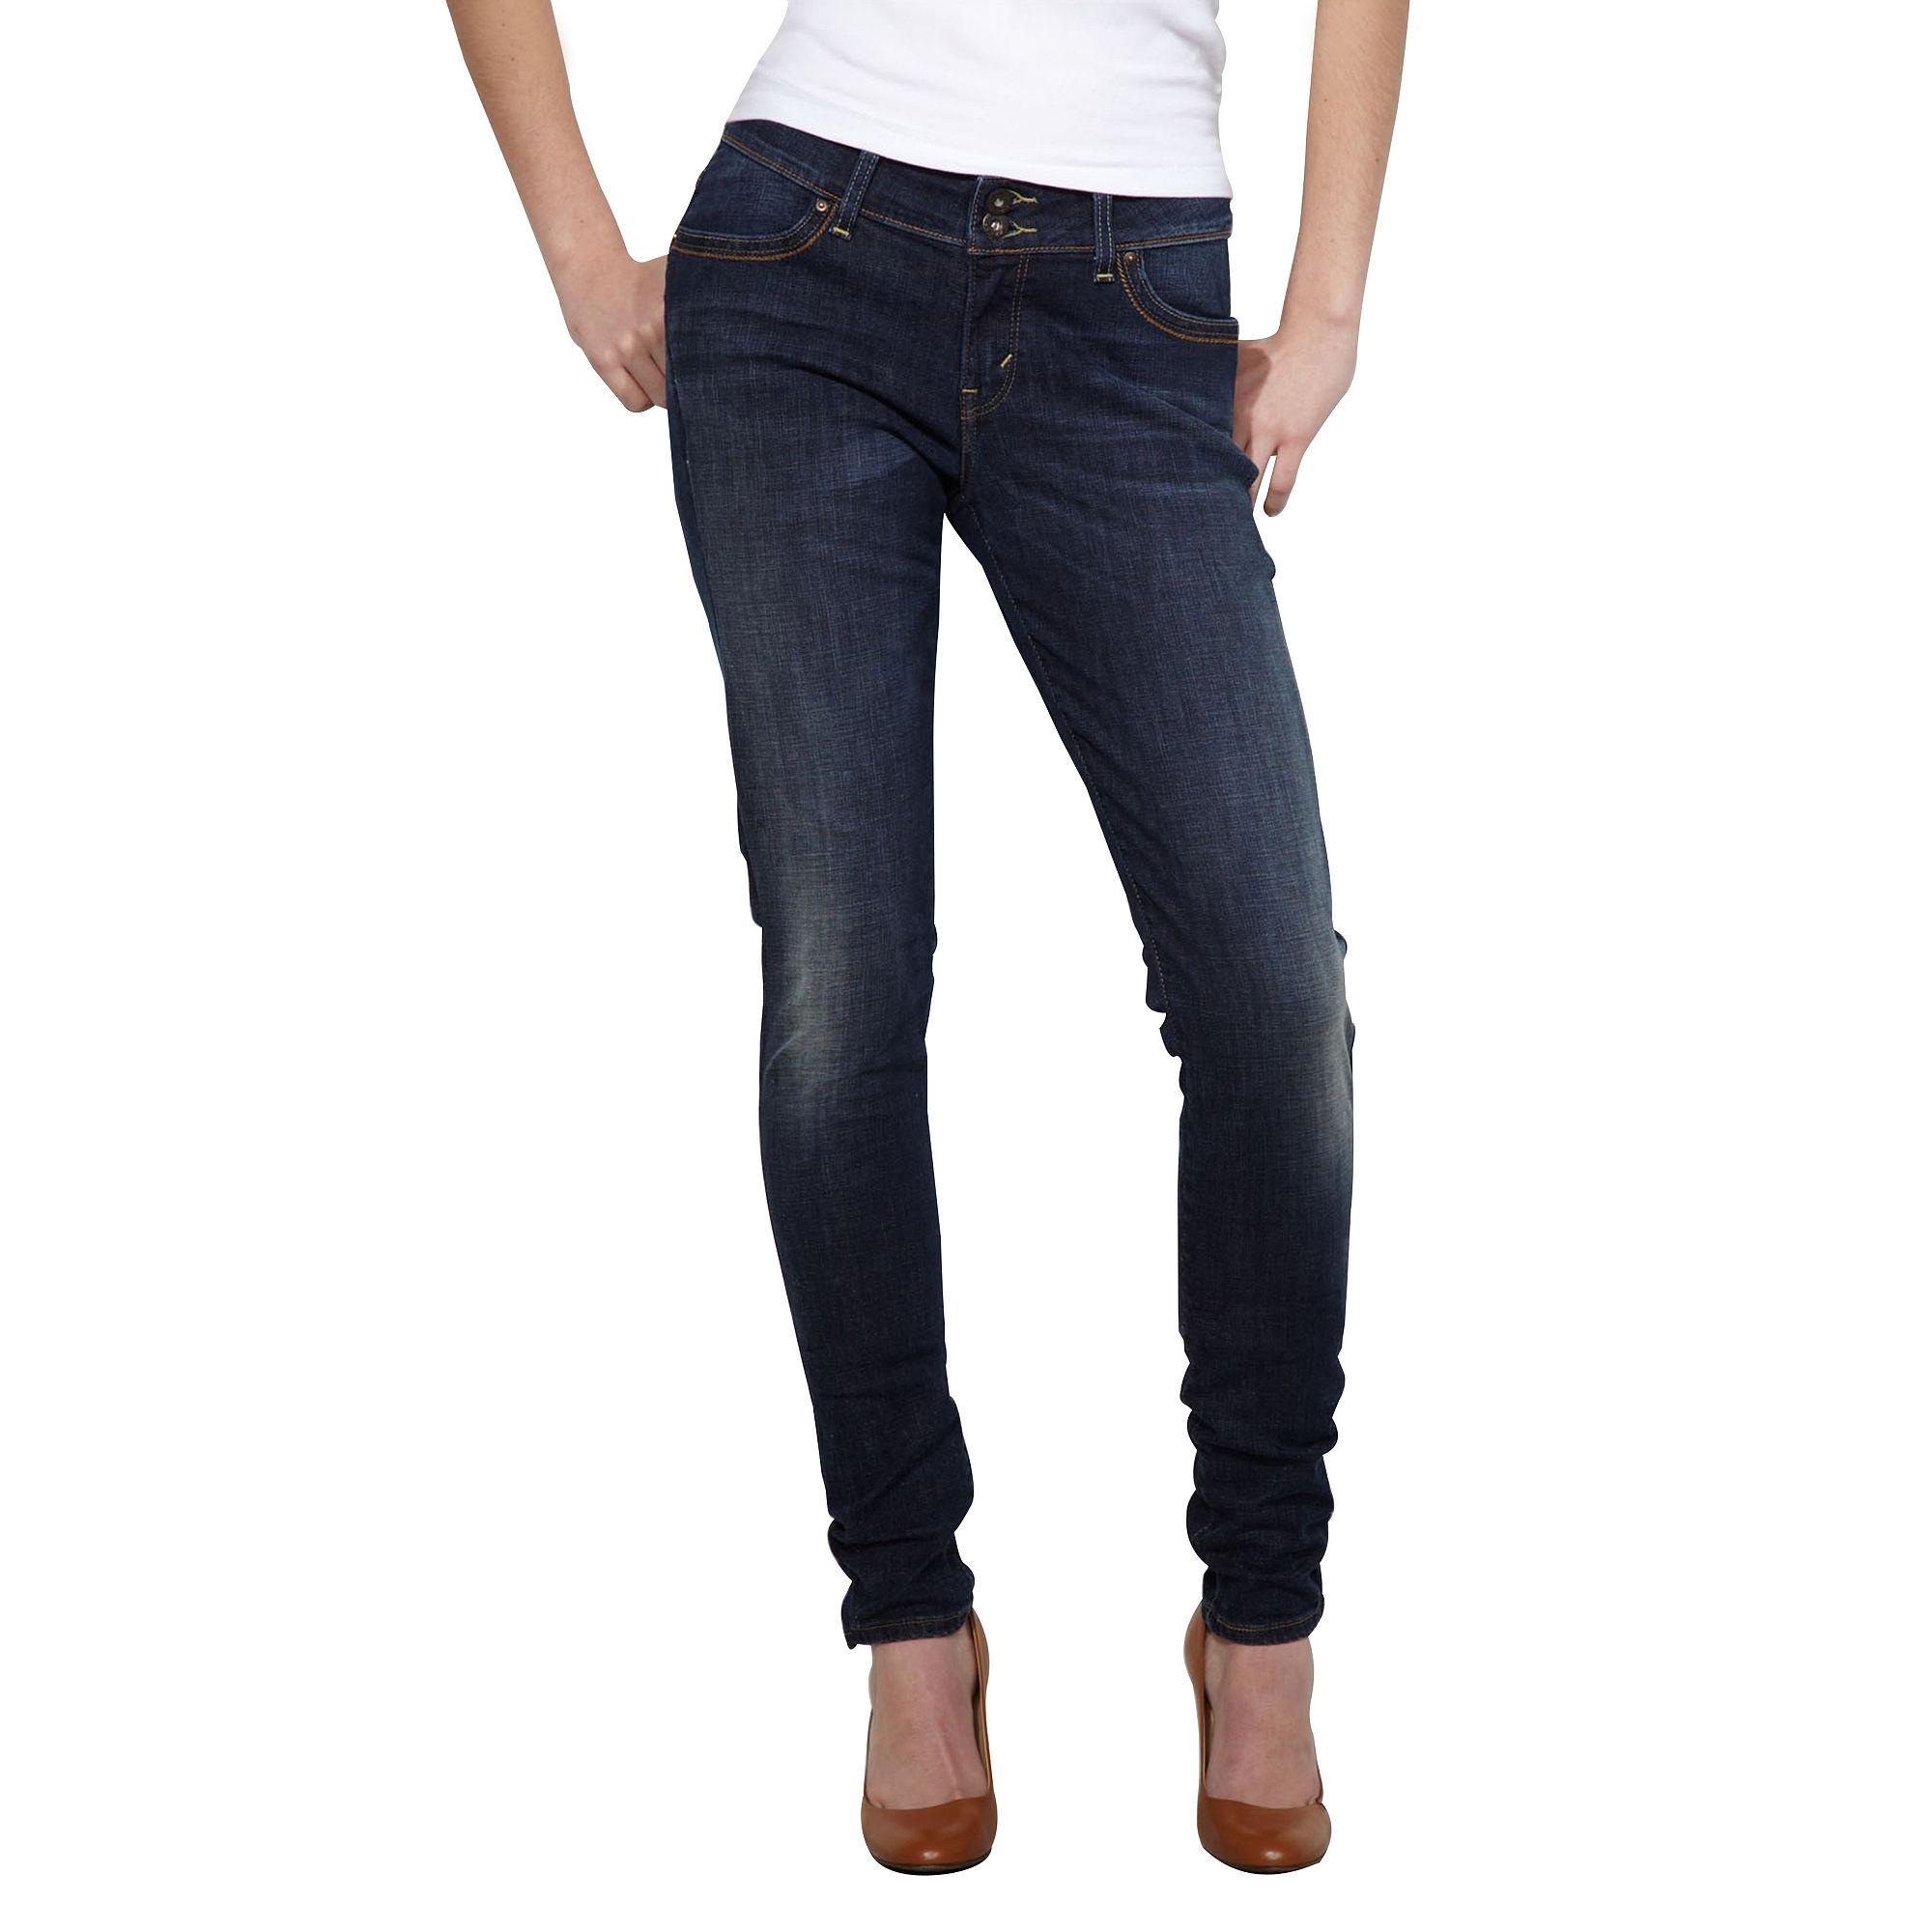 f5a1c947 ... UPC 886878985713 product image for Levis 529 Curvy Skinny Jeans |  upcitemdb.com